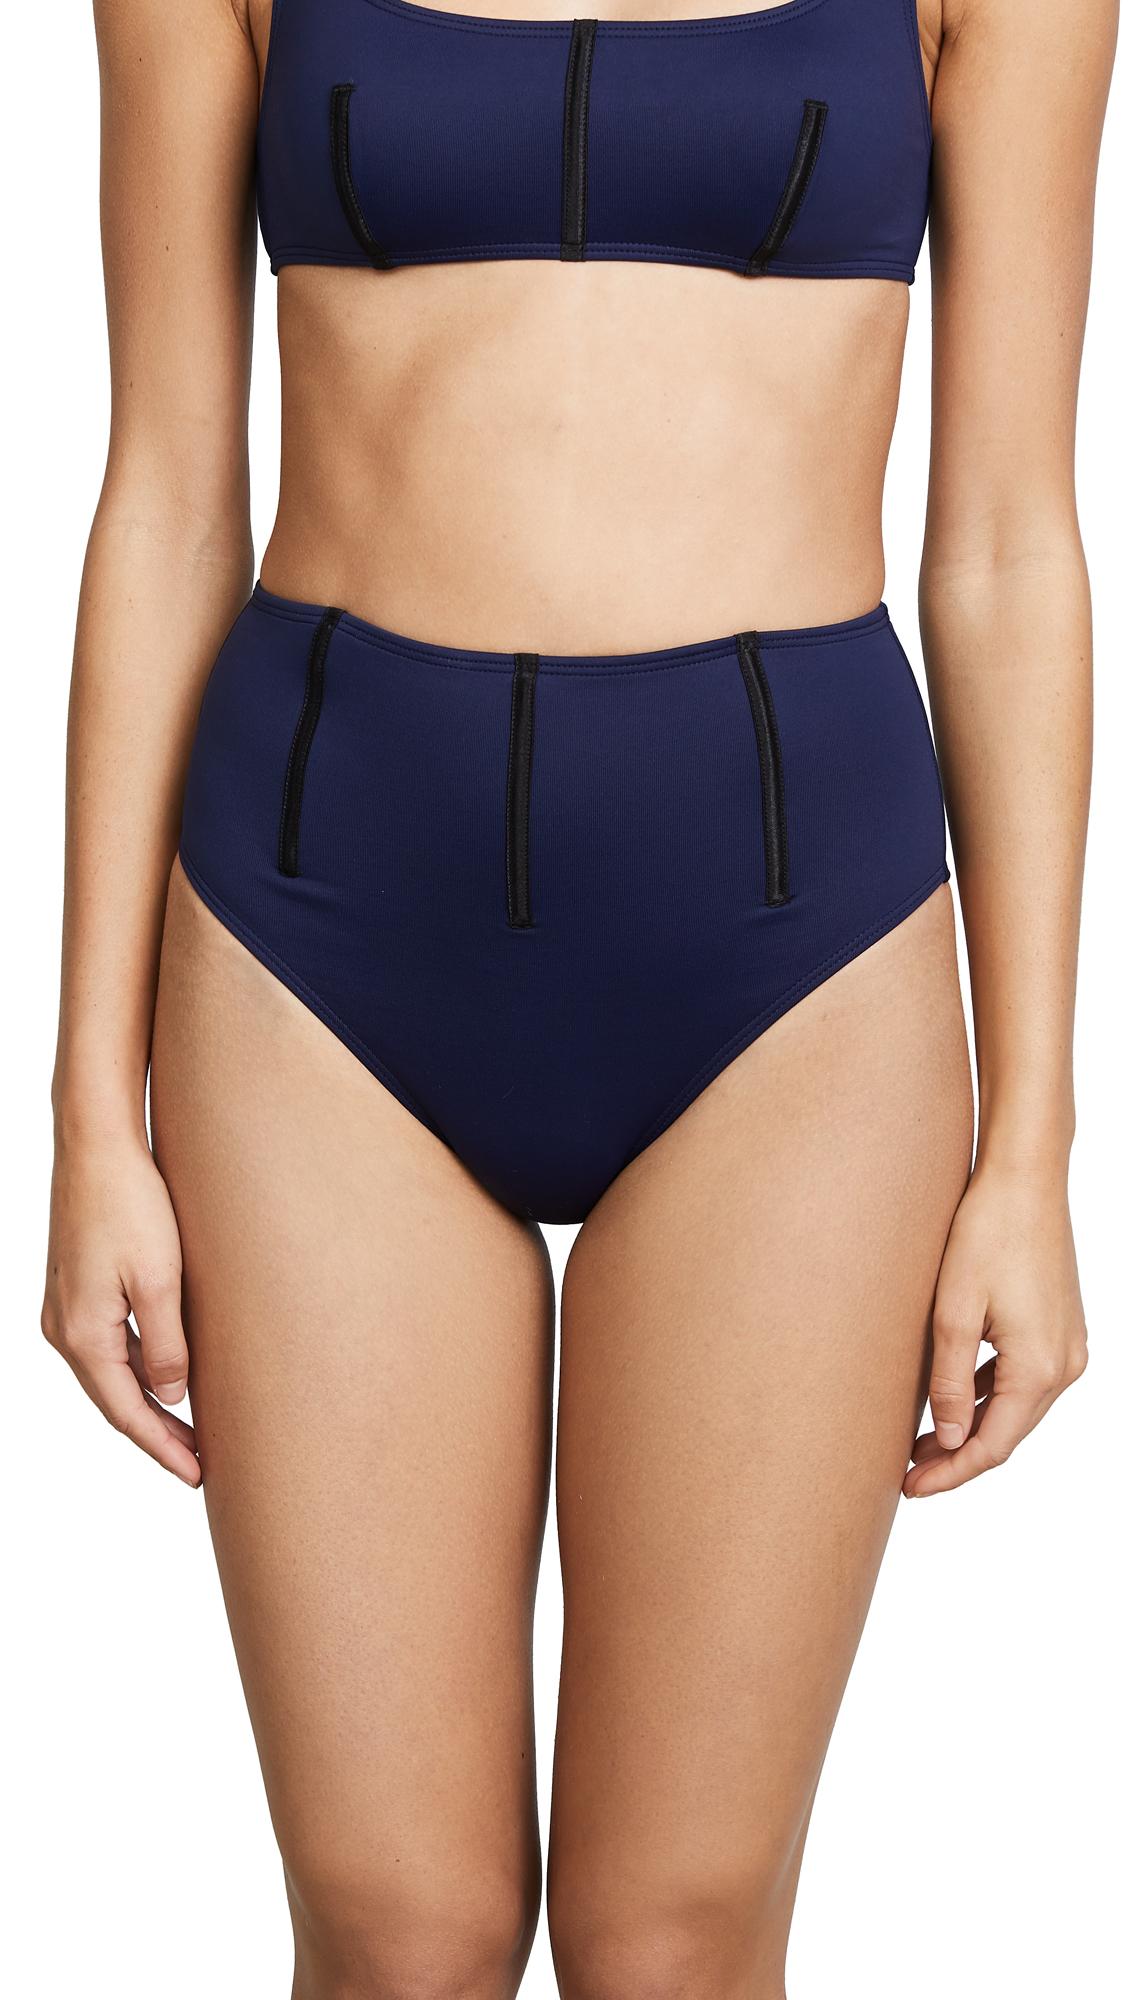 Cushnie Et Ochs Remy High Waisted Bikini Bottom with Boning Detail